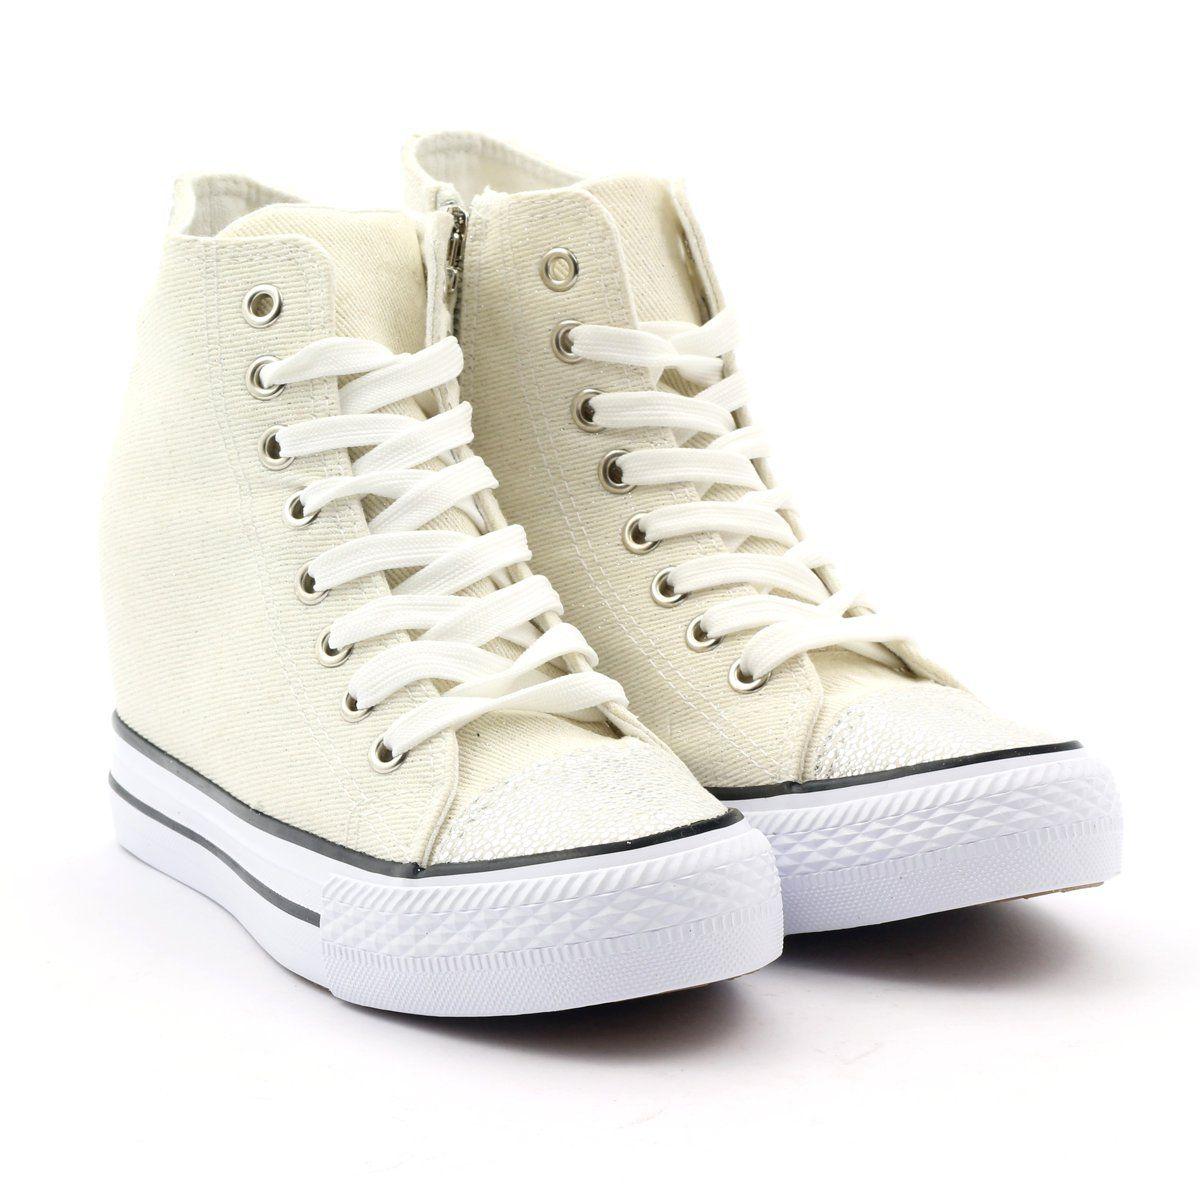 Mcarthur Sneakers Sneakers White Sneakers Sneakers White Womens Sneakers